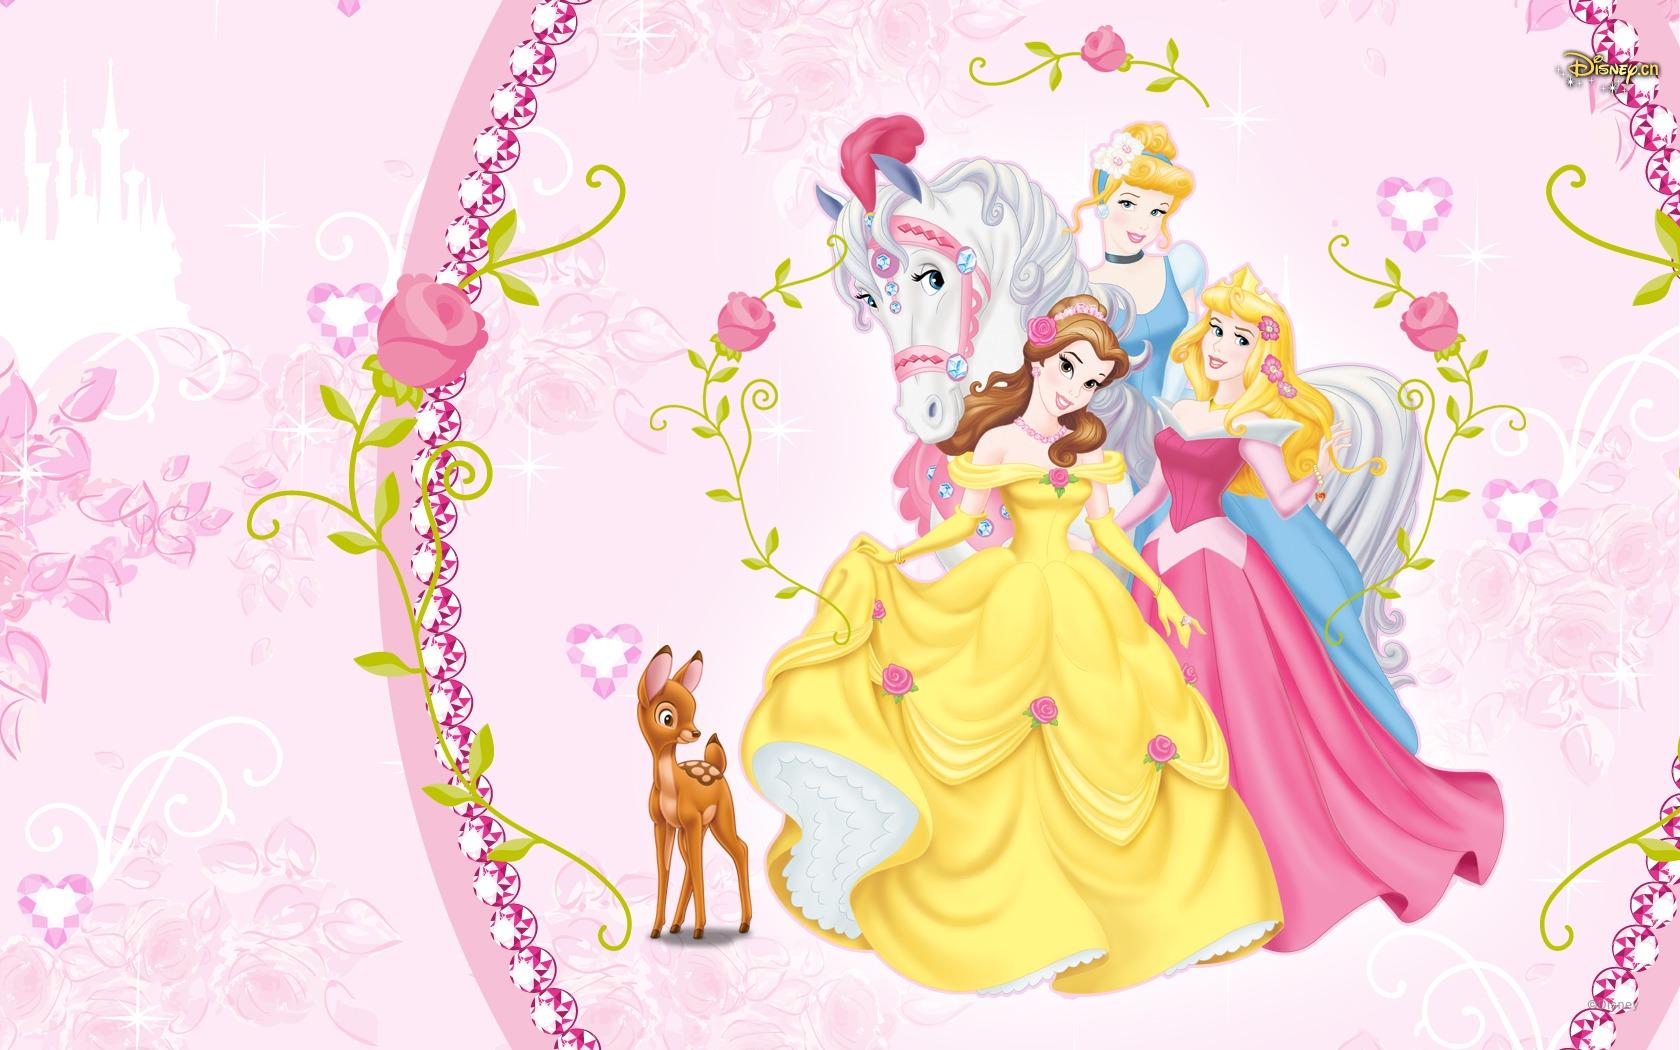 Disney Princess - Disney Princess Wallpaper (33693783) - Fanpop